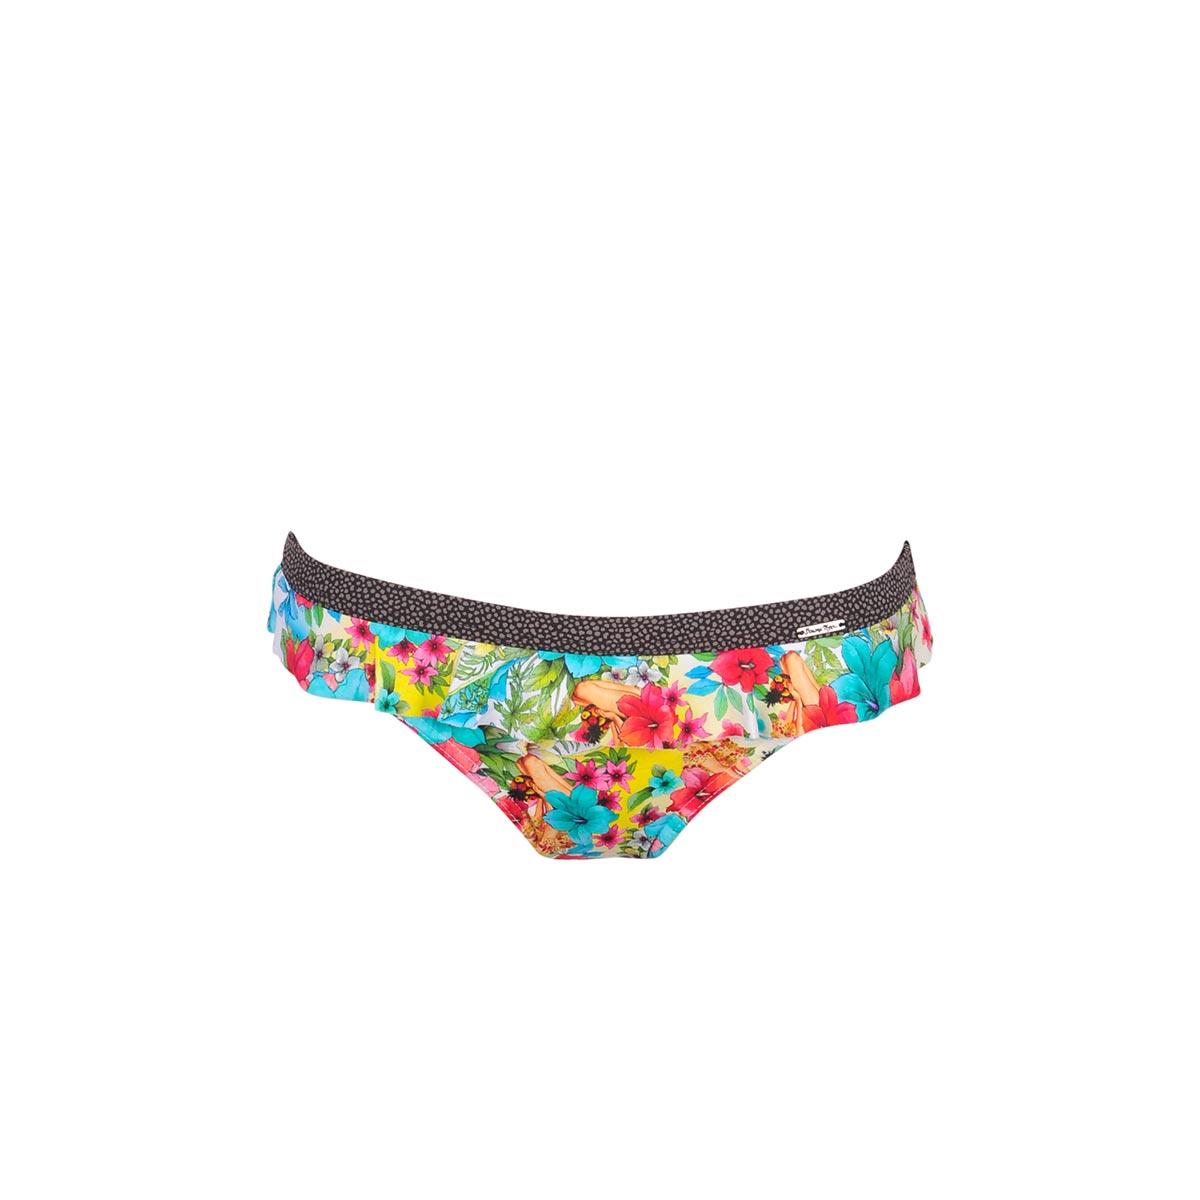 Culotte de maillot de bain multicolore Hualalai (Bas)